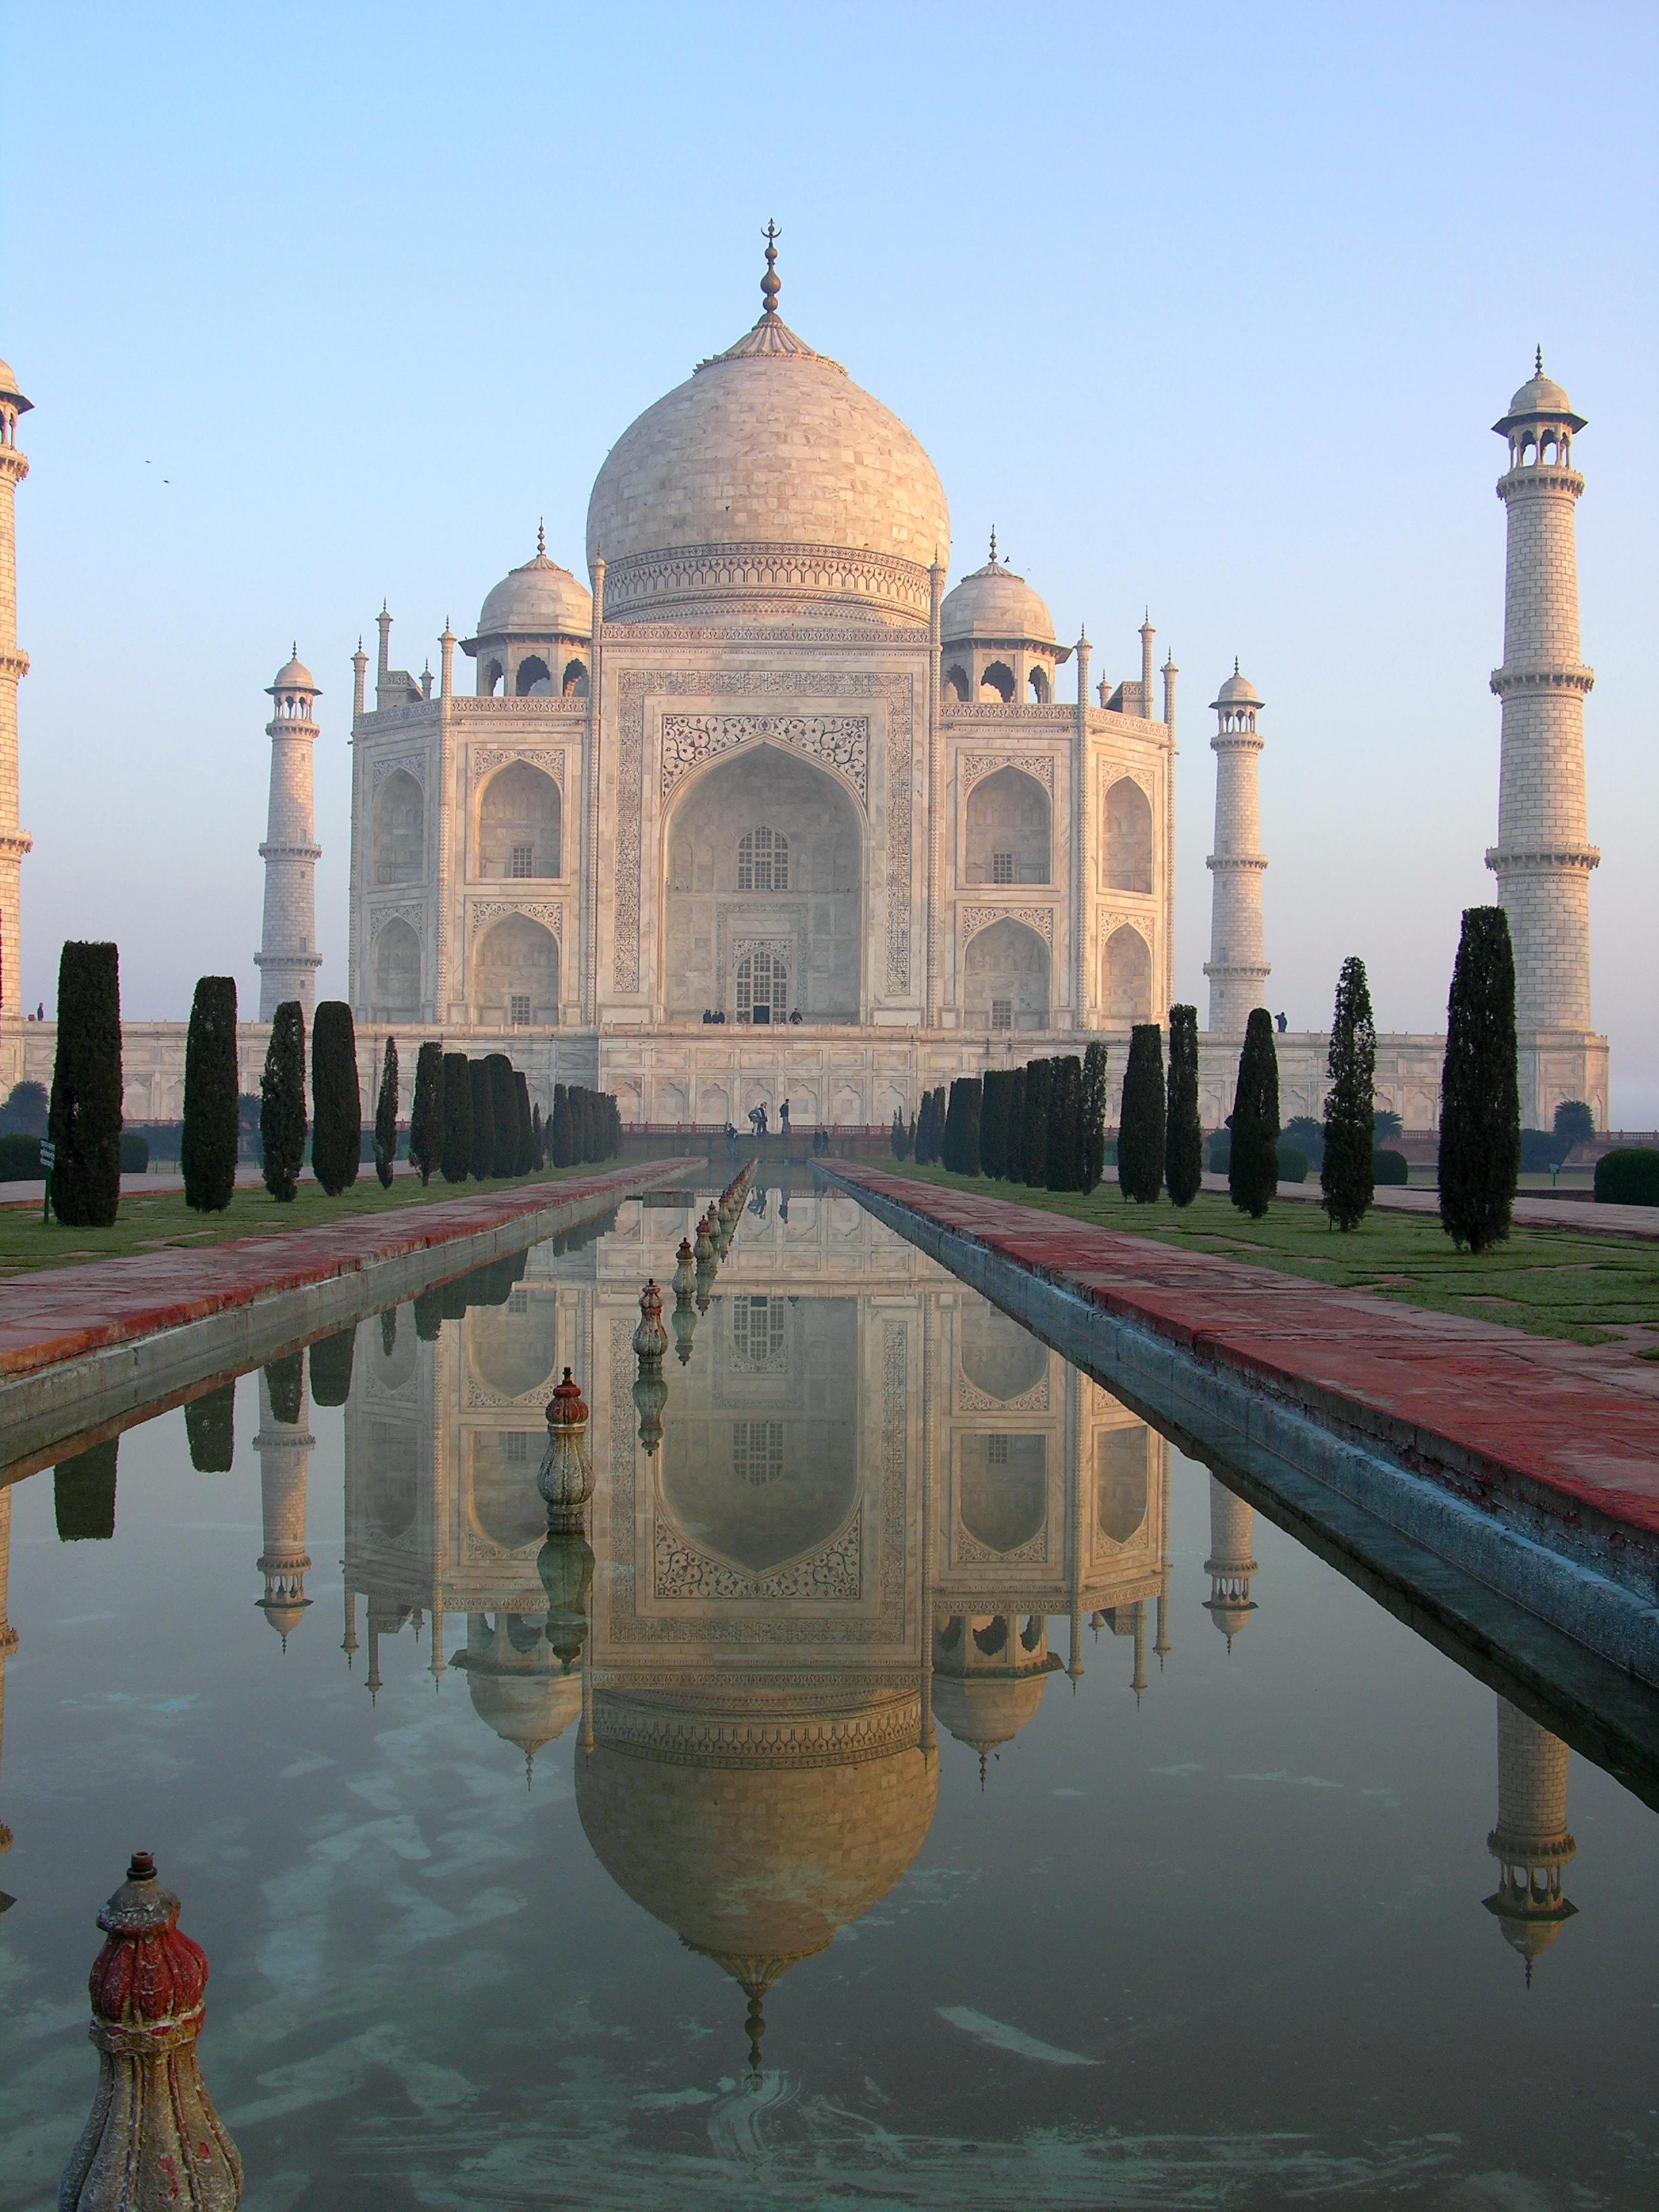 The Taj Mahal Photo credit: Sanjay Chatterji